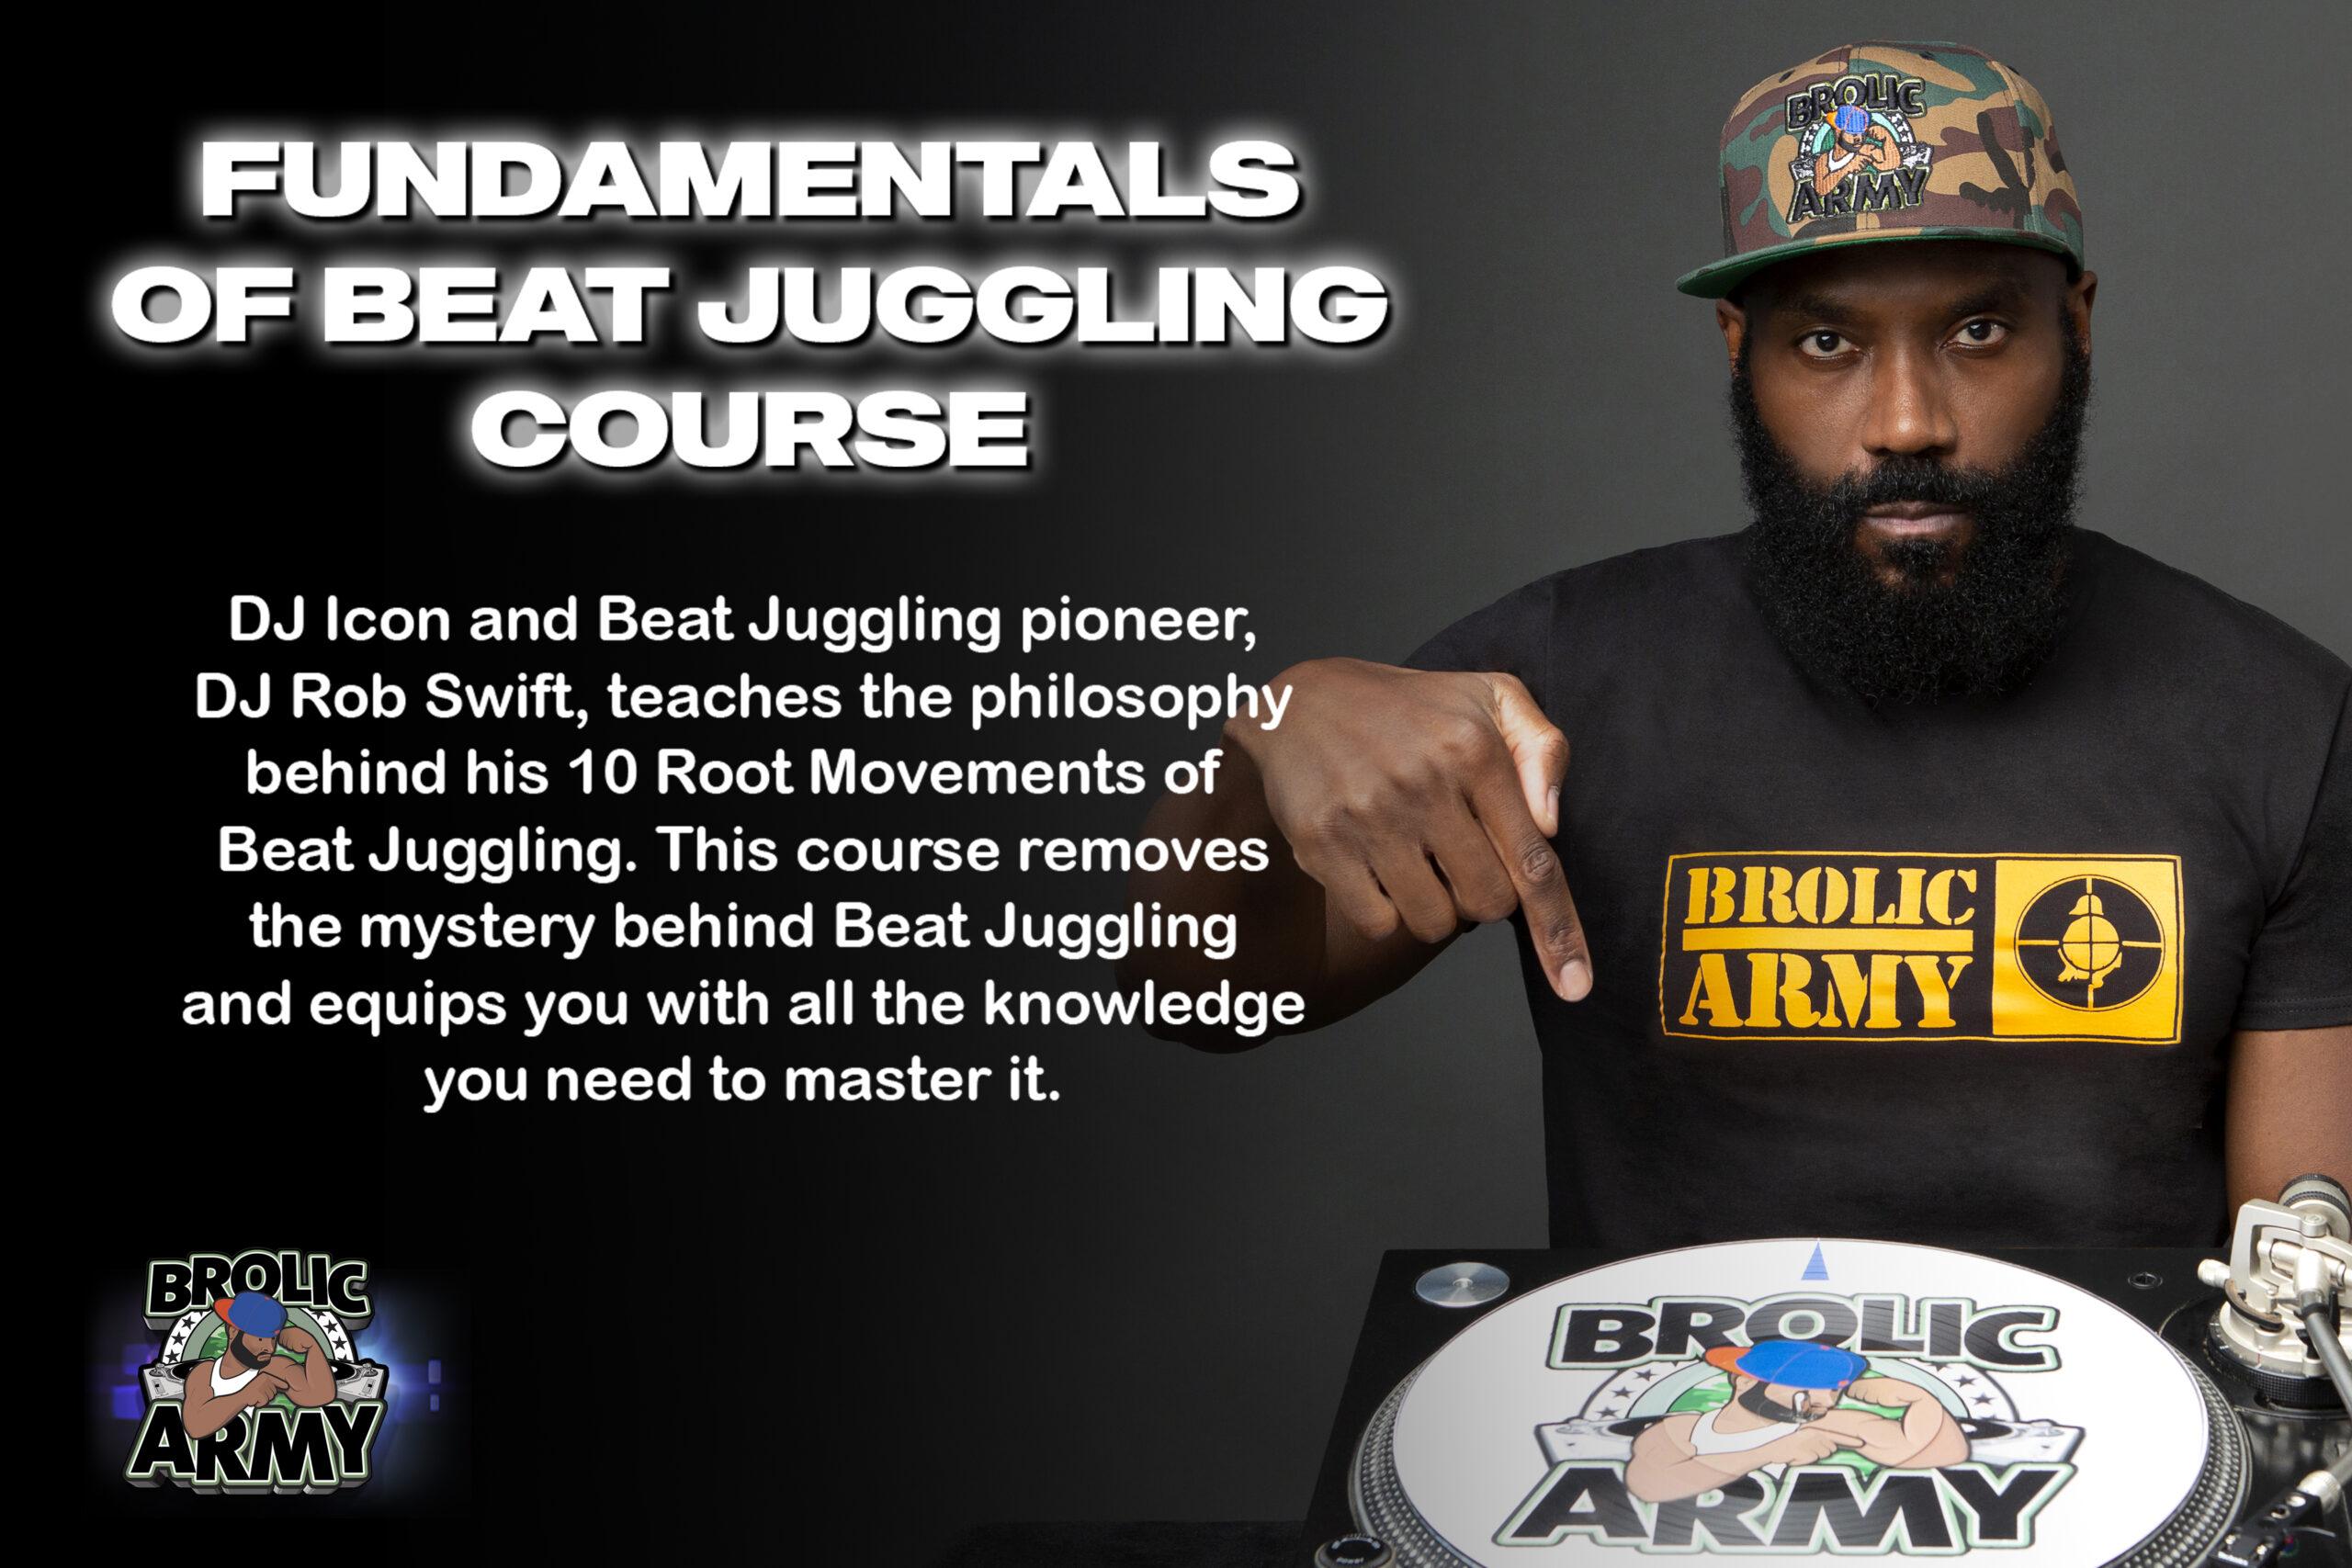 Advanced Beat Juggling